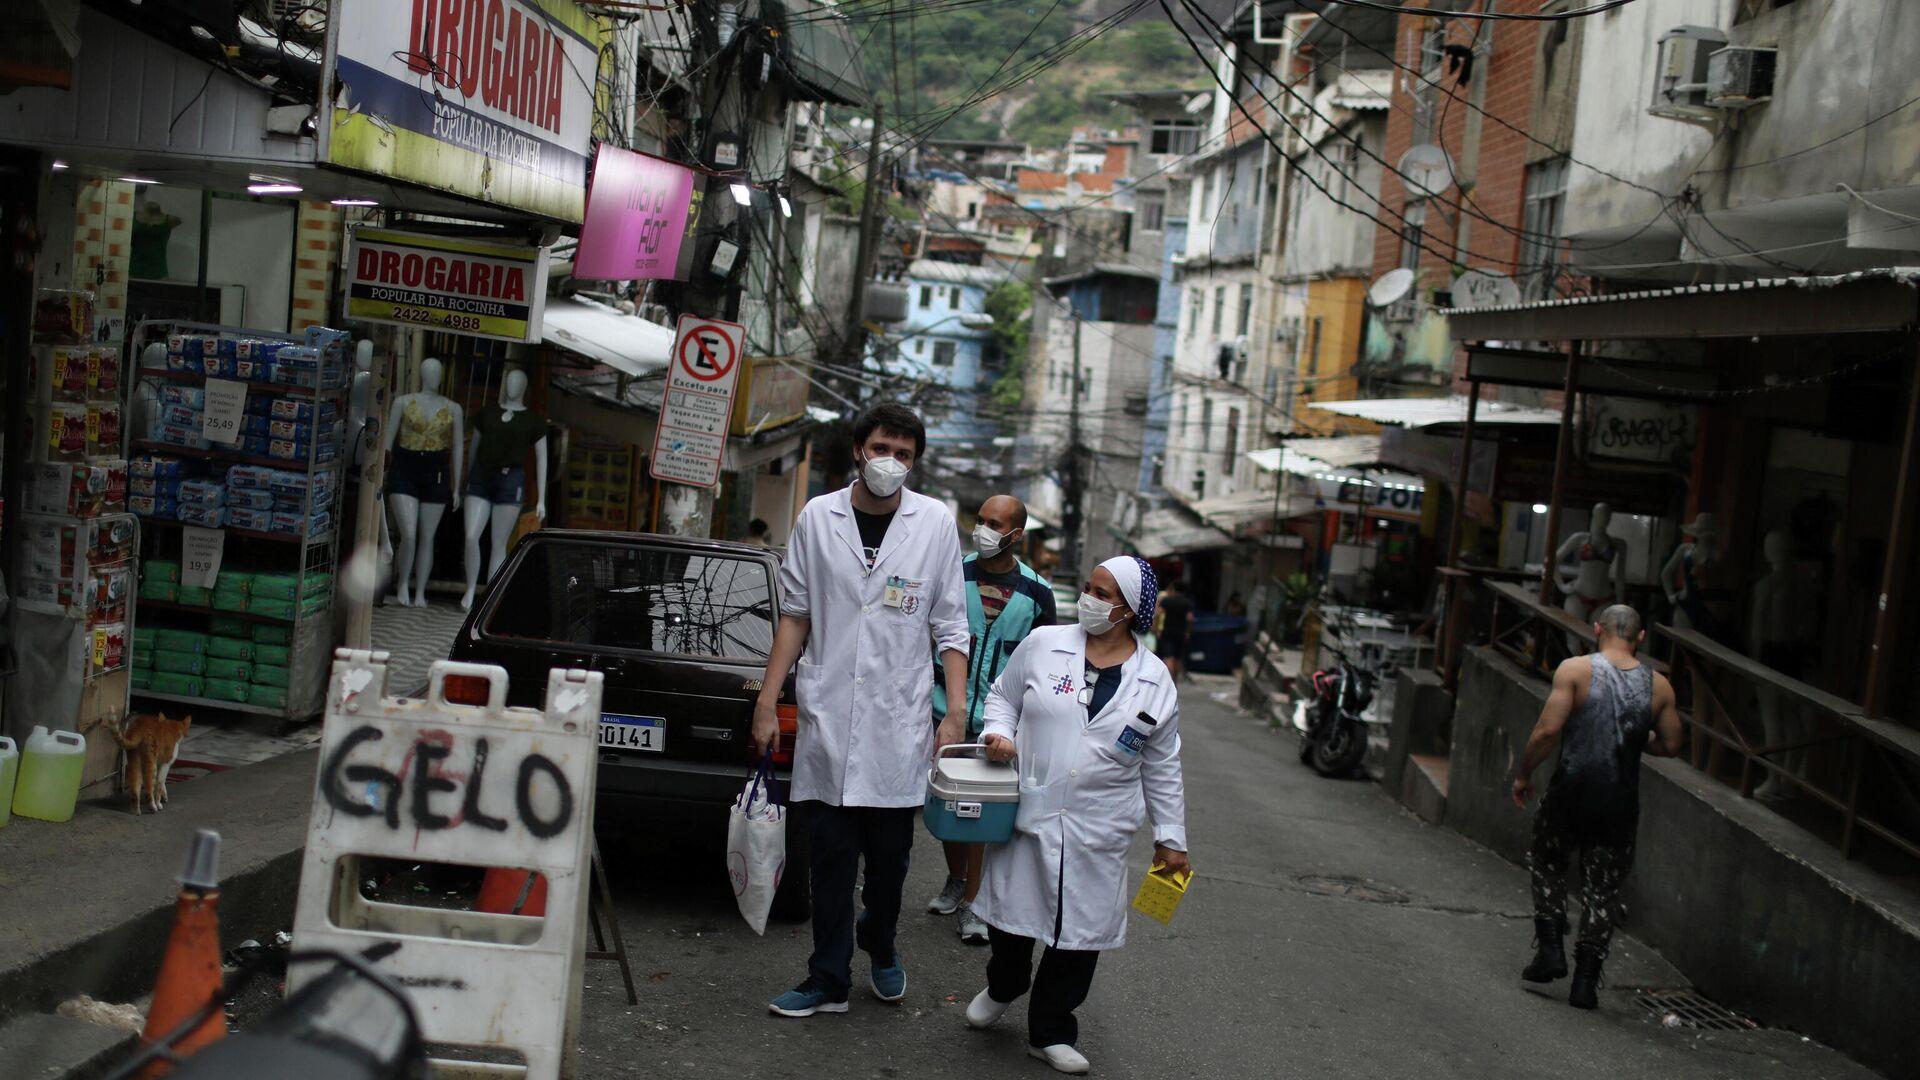 Médicos en las calles de Río de Janeiro - Sputnik Mundo, 1920, 26.02.2021